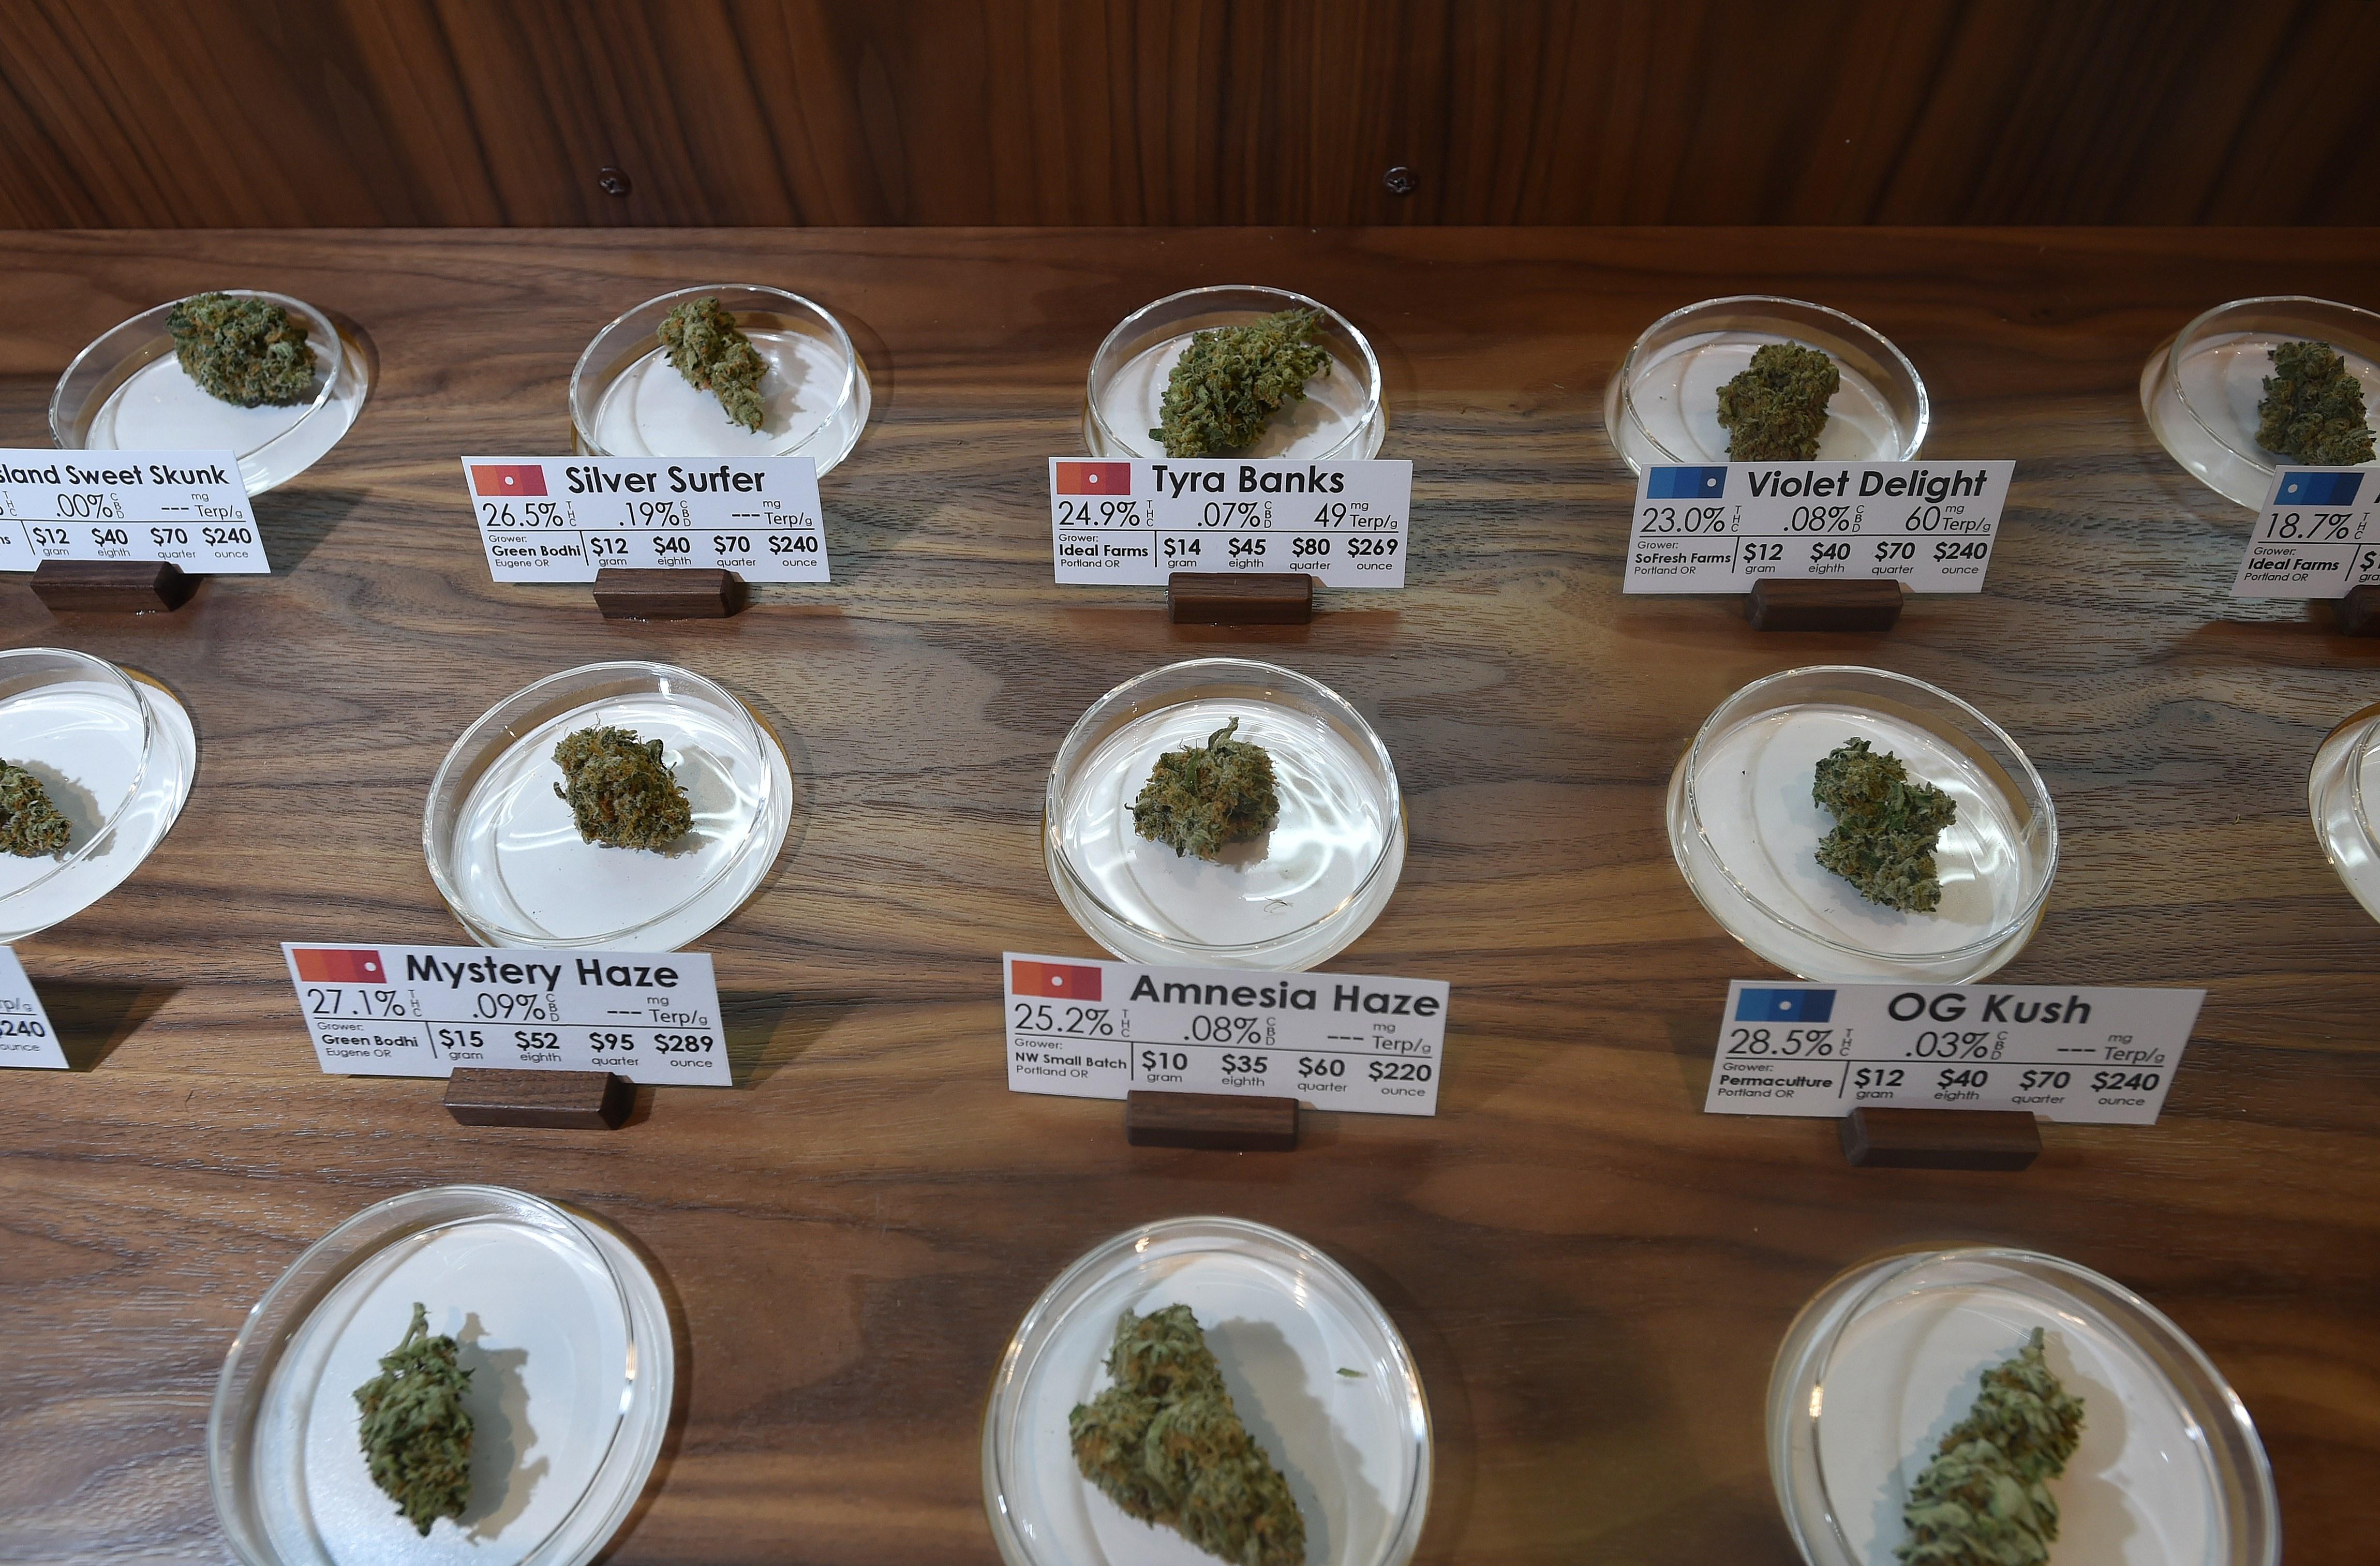 Samples on display at Farma, a marijuana dispensary in Portland, Oregon, on October 4, 2015.